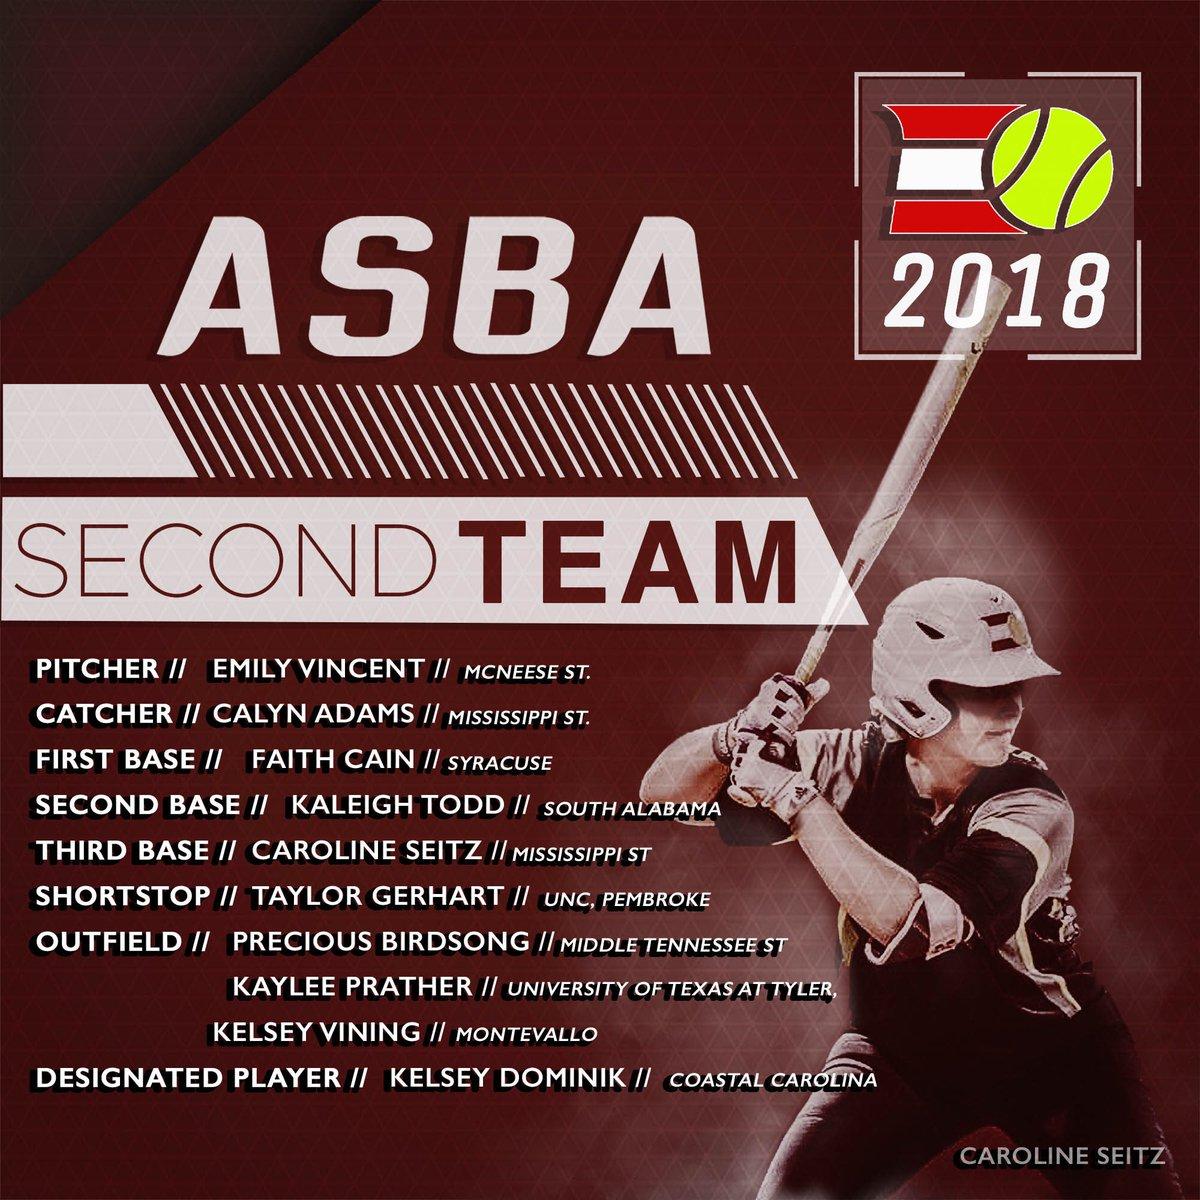 Your 2018 Second Team All-ASBA selections. STATS:  https:// asbasoftball.com/summer-statist ics/ &nbsp; …  Congratulations to all and thank you for a great summer. @HailStateSB @McNeeseSoftball @CuseSB @WeAreSouth_SB @UNCP_Softball @MT_Softball @MontevalloSB @CoastalSoftball @Patriot_sb  #ASBA<br>http://pic.twitter.com/QaJgbvvUey